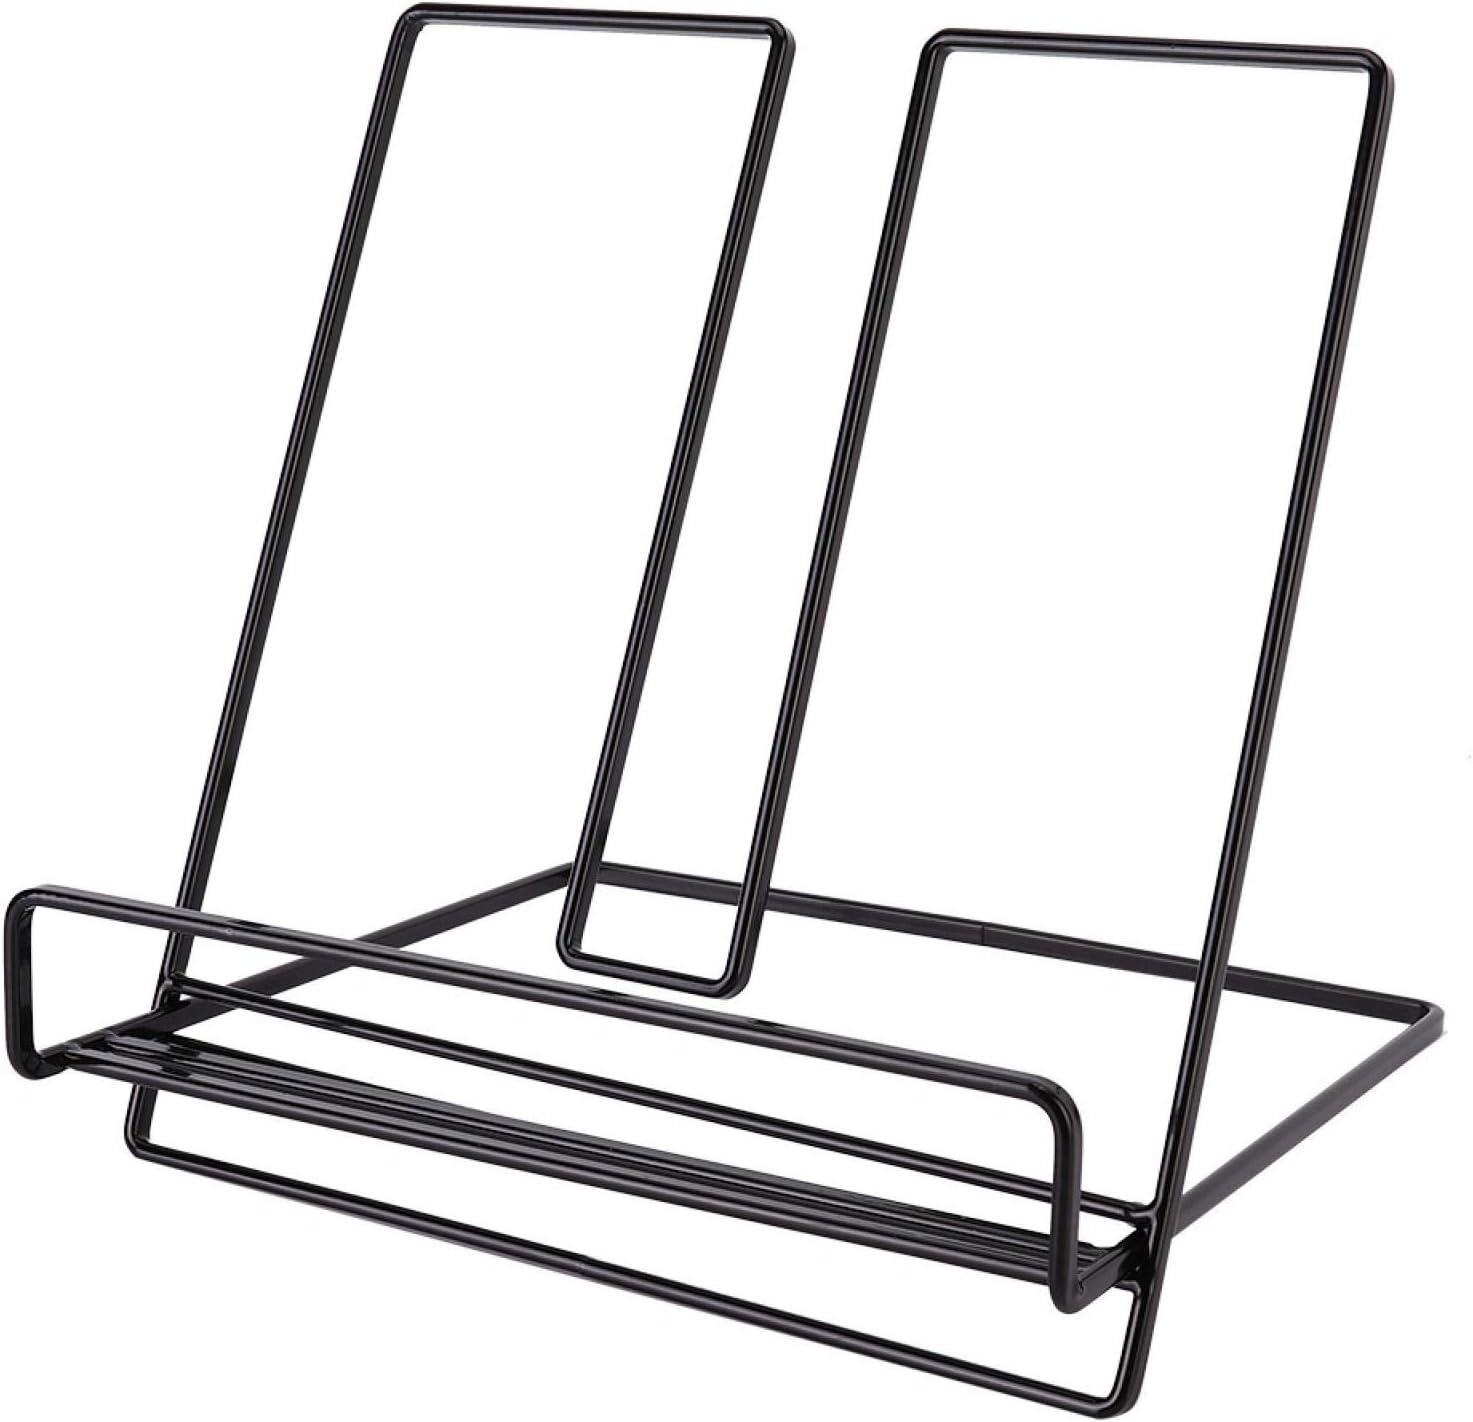 OUKENS Book Rack, Iron Tabletop Book Shelf Rack Tablet Computer